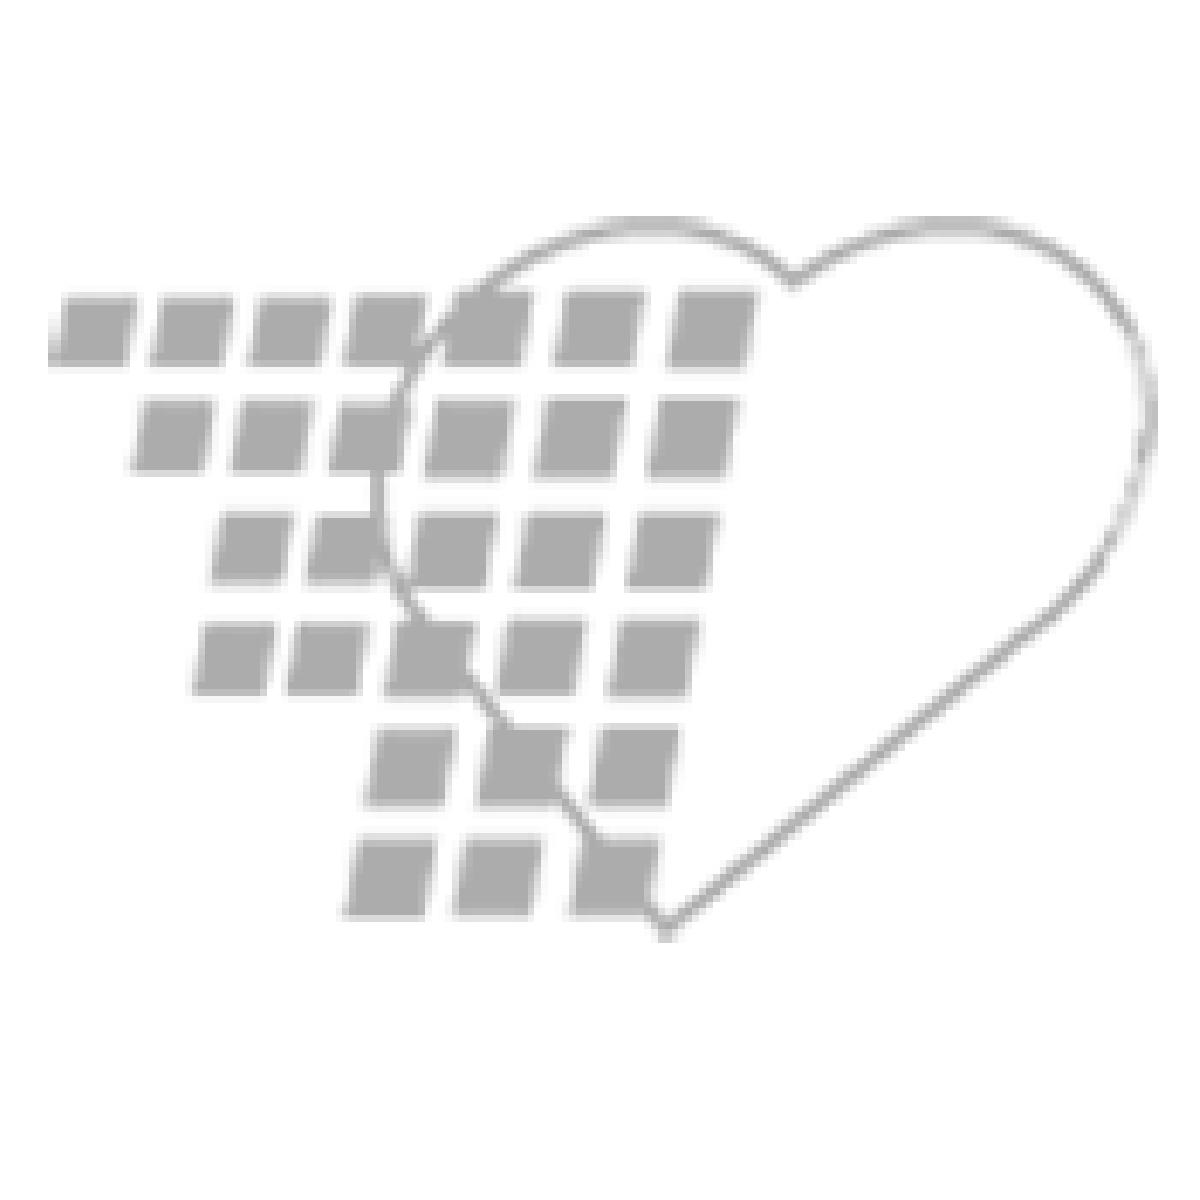 05-87-8999 BARD® Foley Tray 16Fr